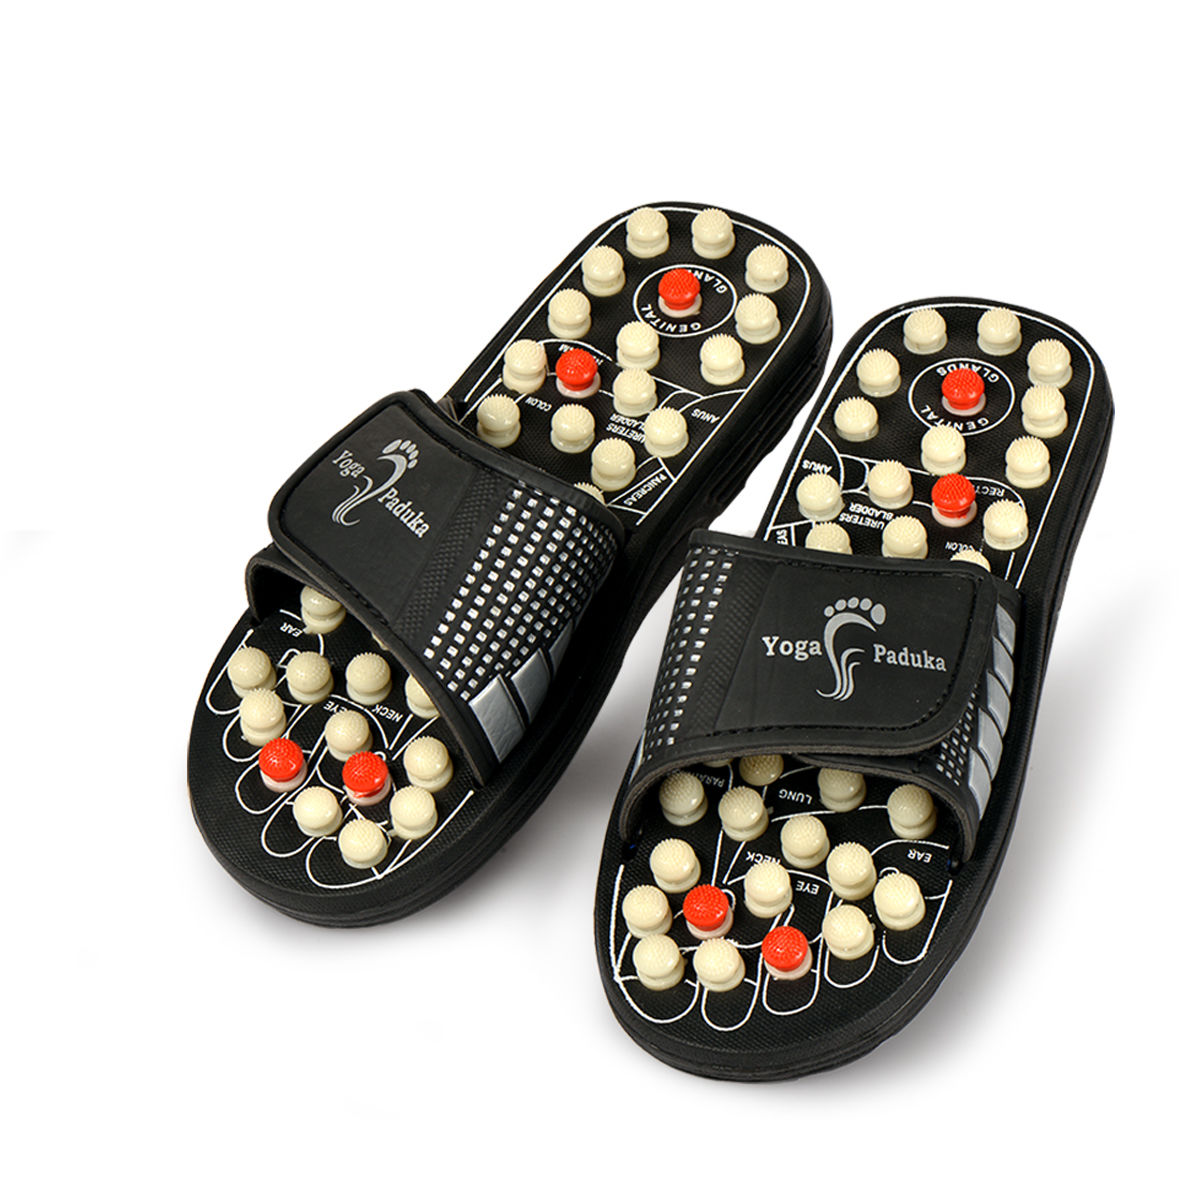 Buy Acupressure Yoga Slippers Online at